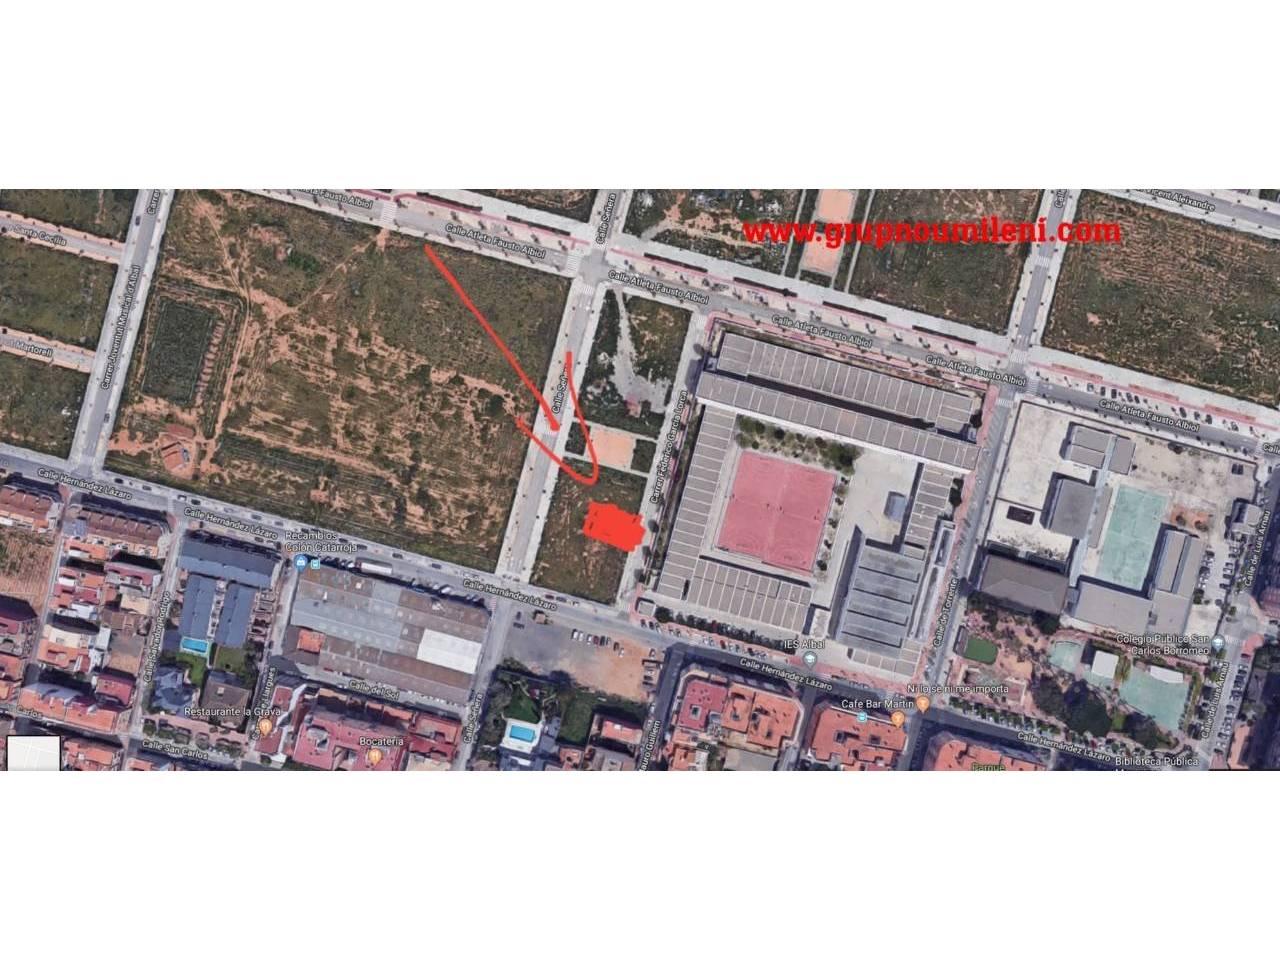 Solar urbà  Urbanizable. 120 m²,  120 m² solar, asfaltado, edificaciones 3 plantas, cali